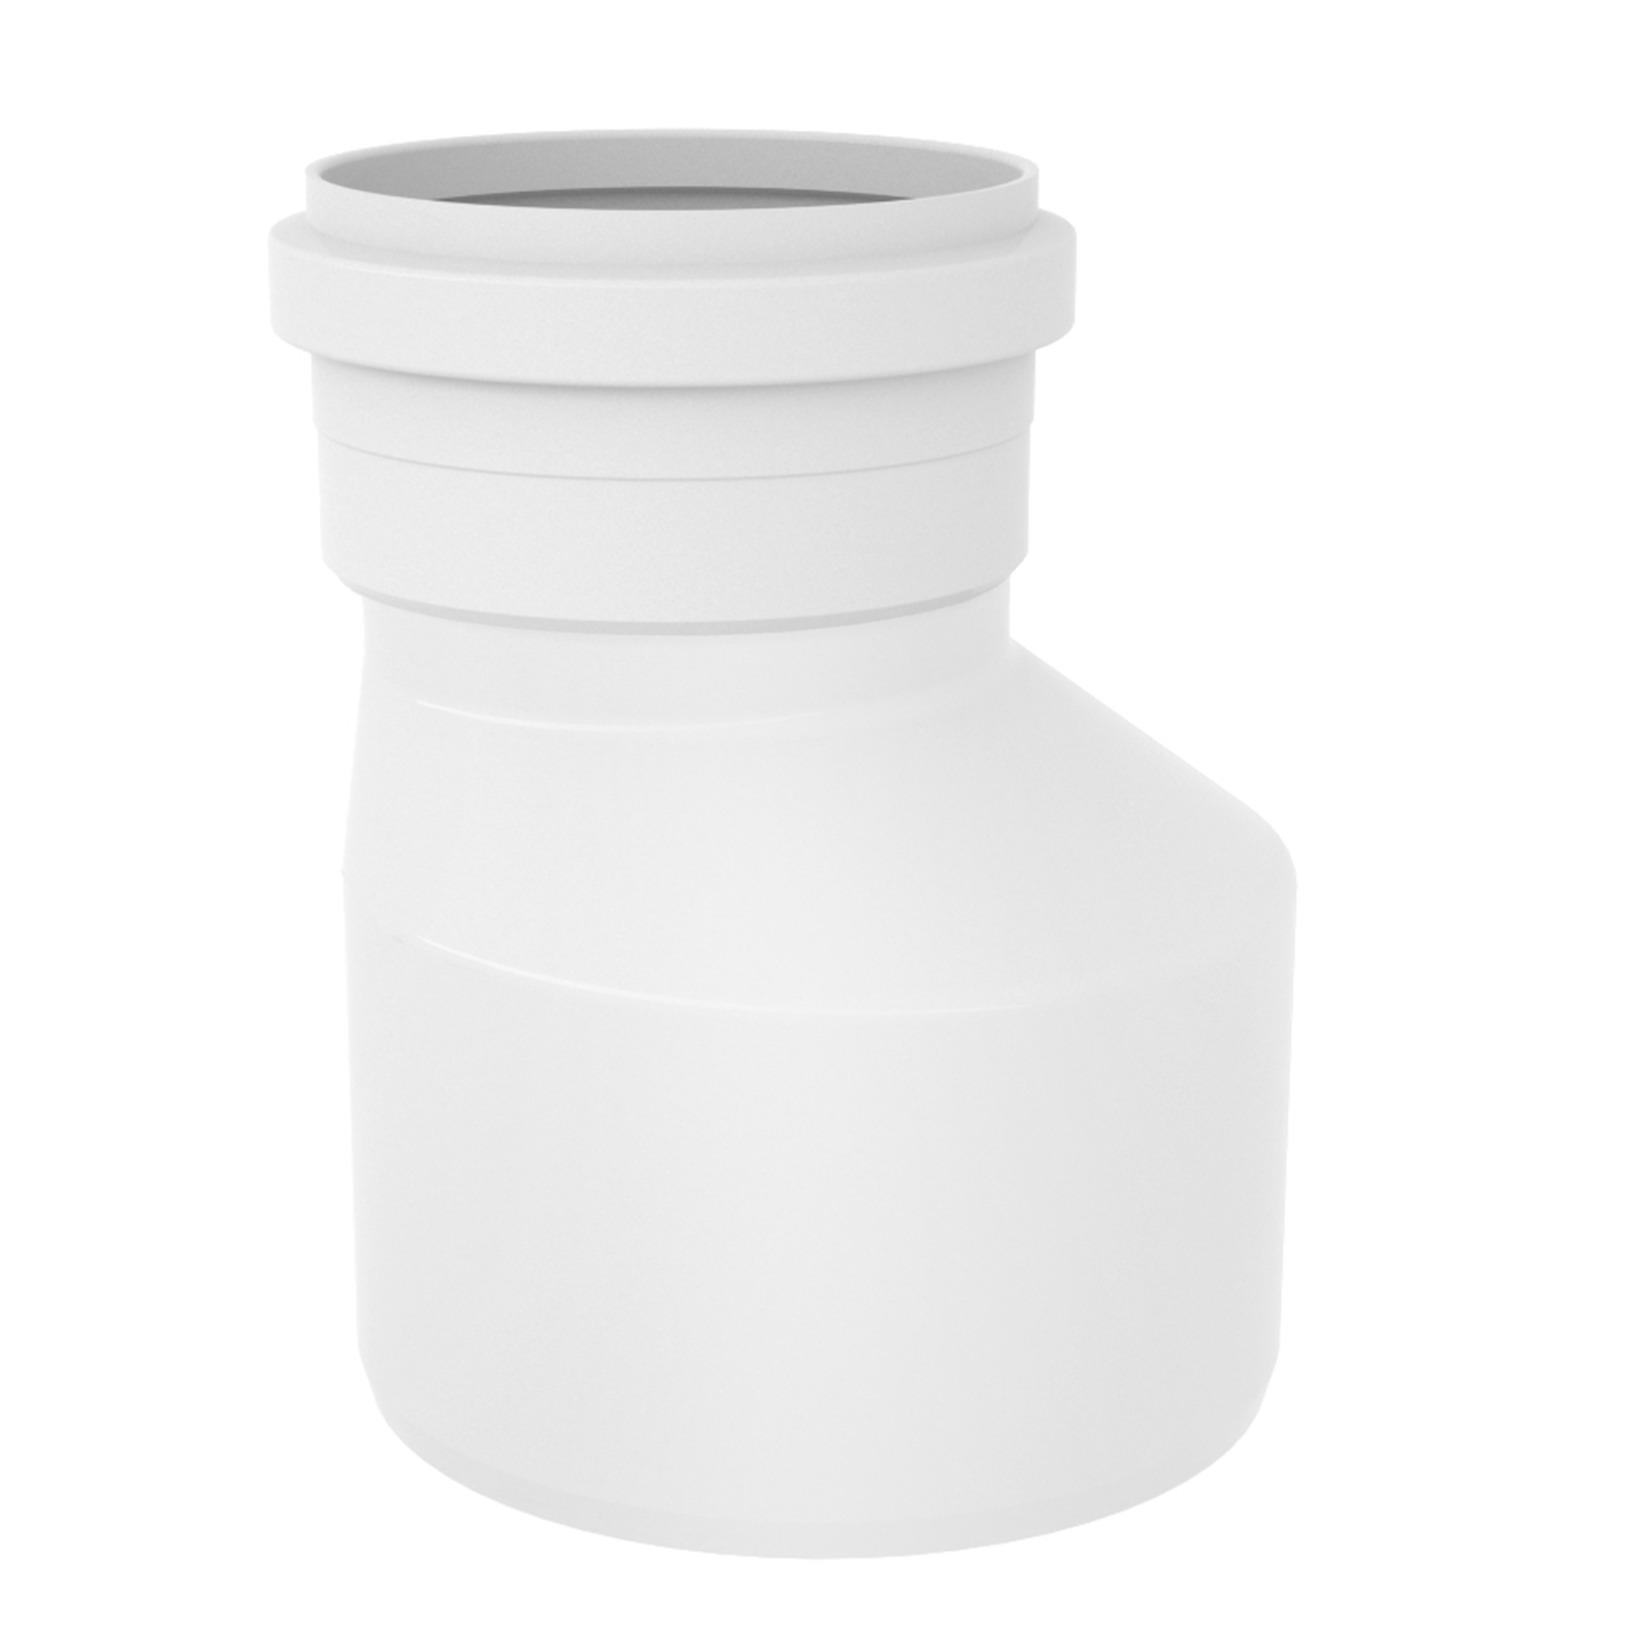 Reducao Excentrica para Esgoto PVC Branco 100 mm x 75 mm - Tigre